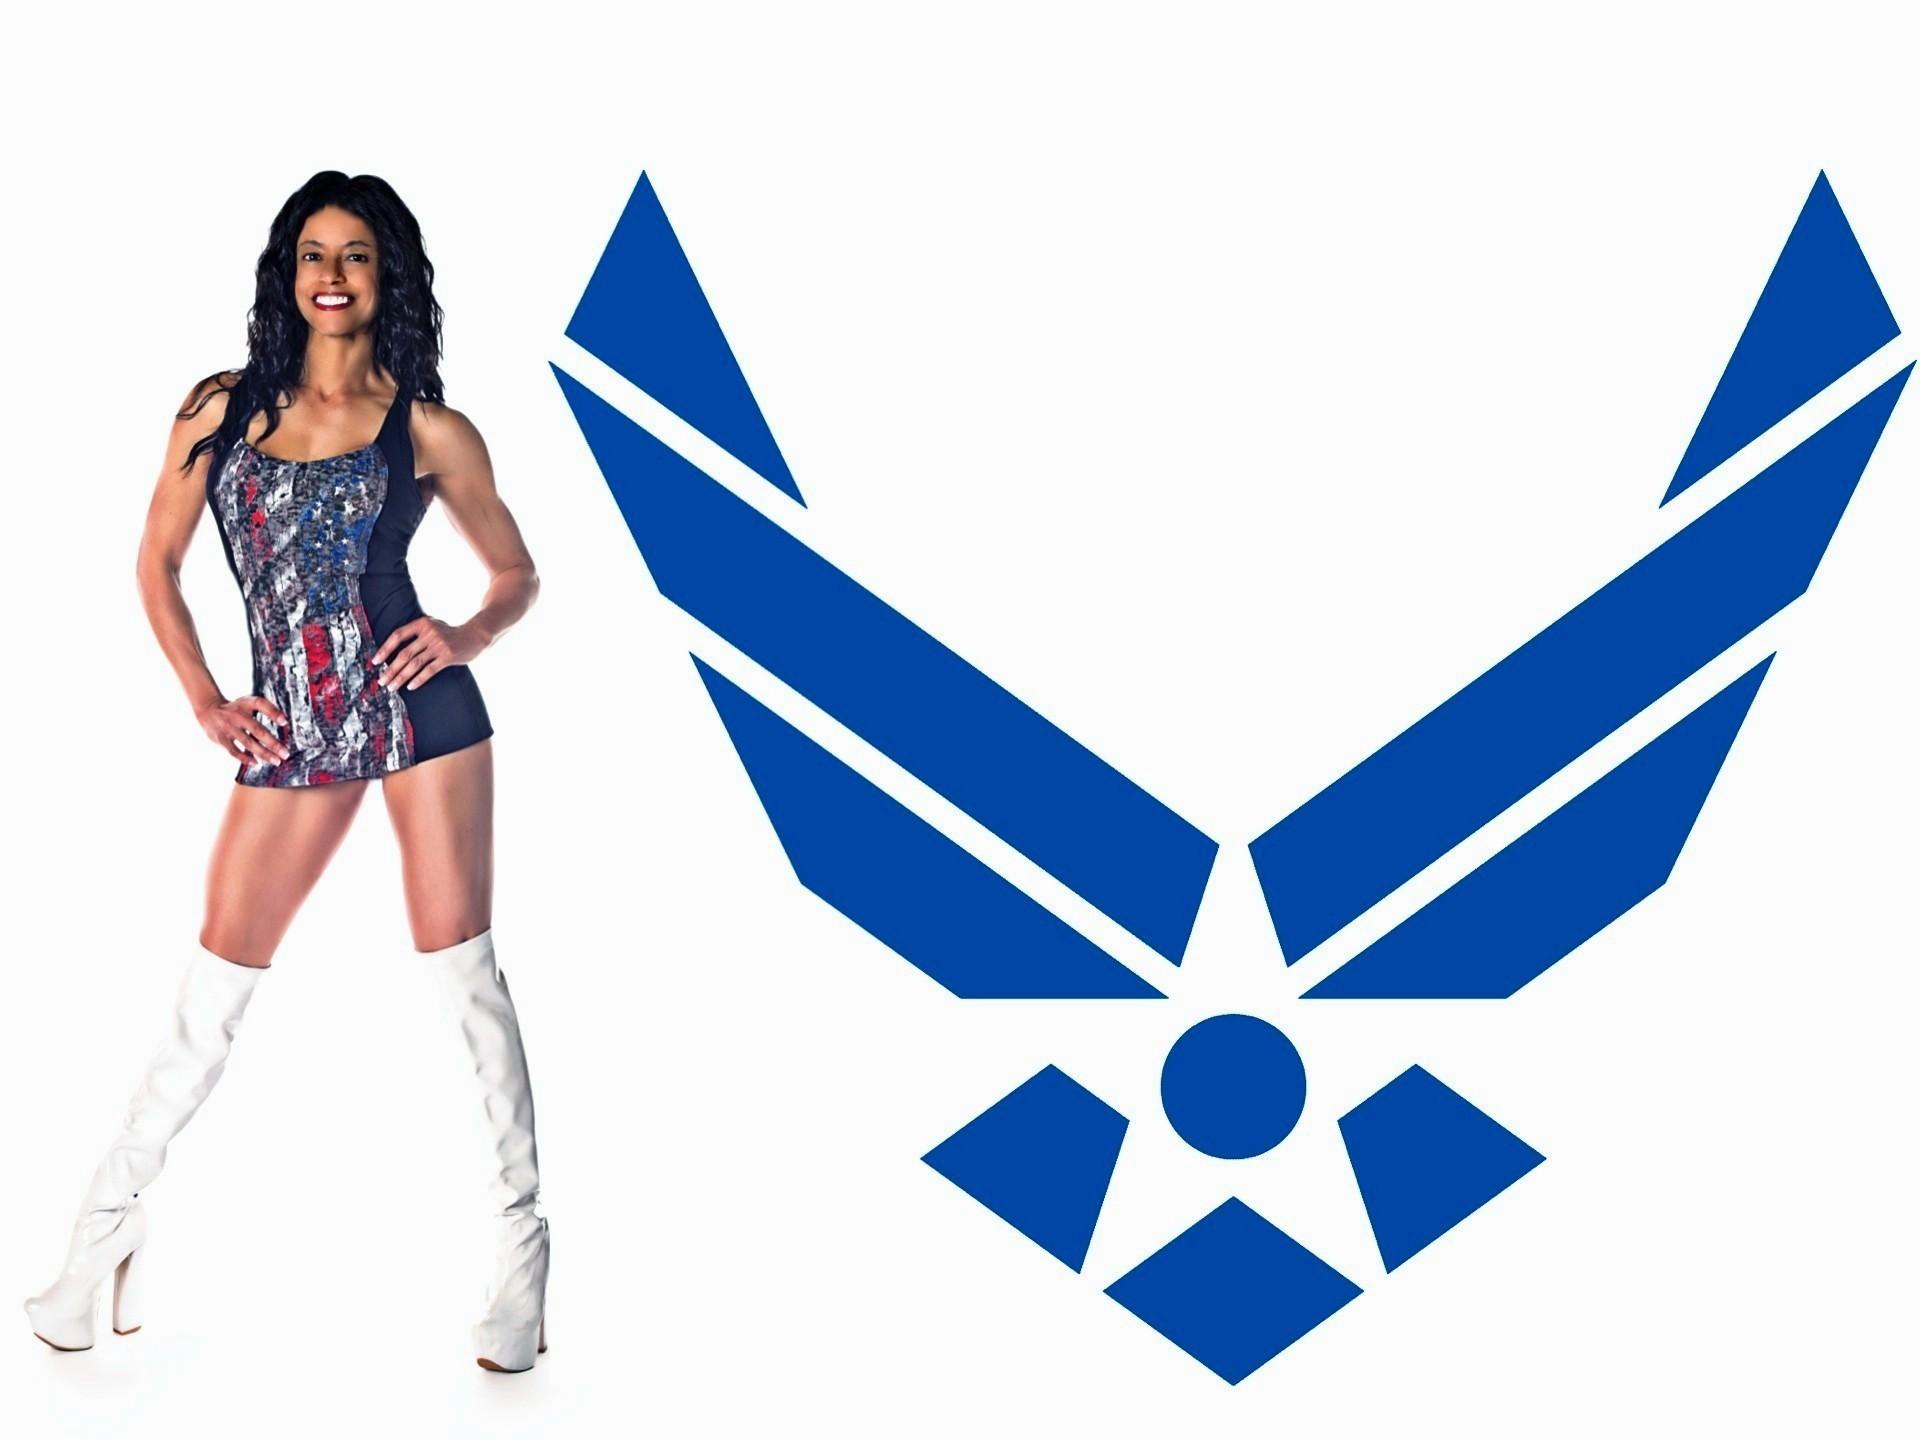 airforcepinup air force pin up girl wallpaper pin up